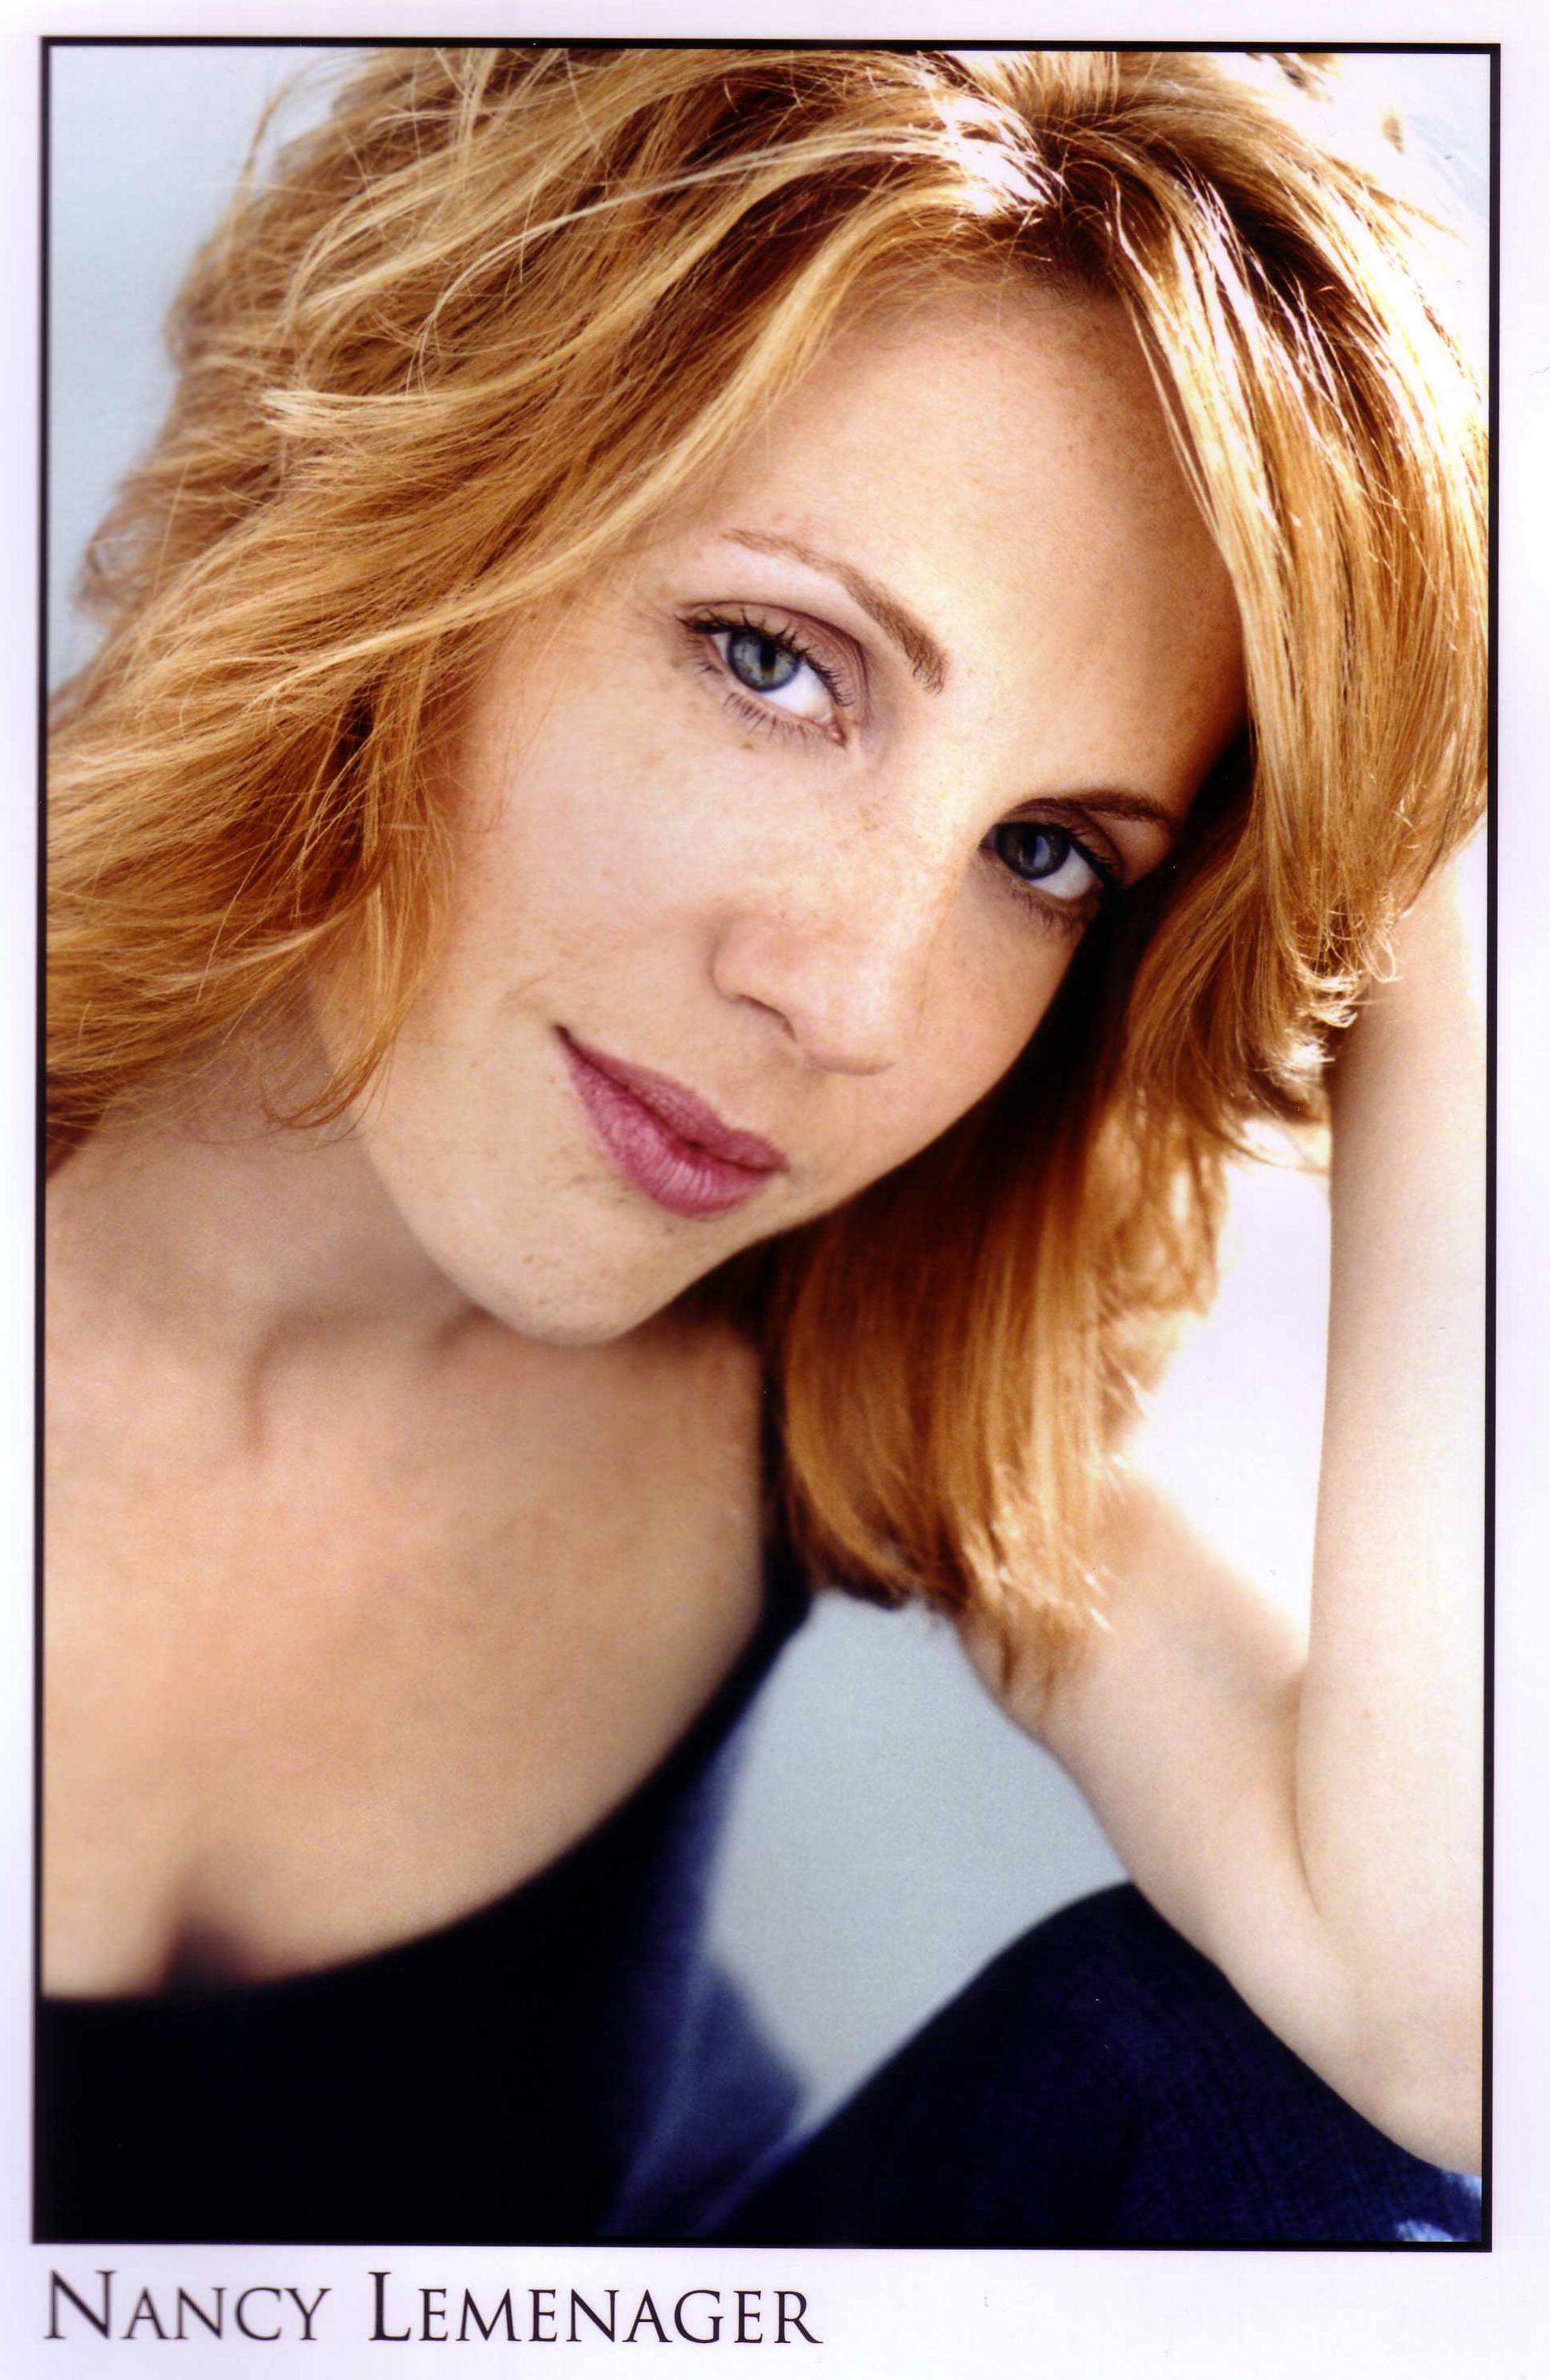 Billy Van,Natasha Richardson (1963?009) Porn pics & movies Jaime King USA 2 1998-1999,Thea Vidale